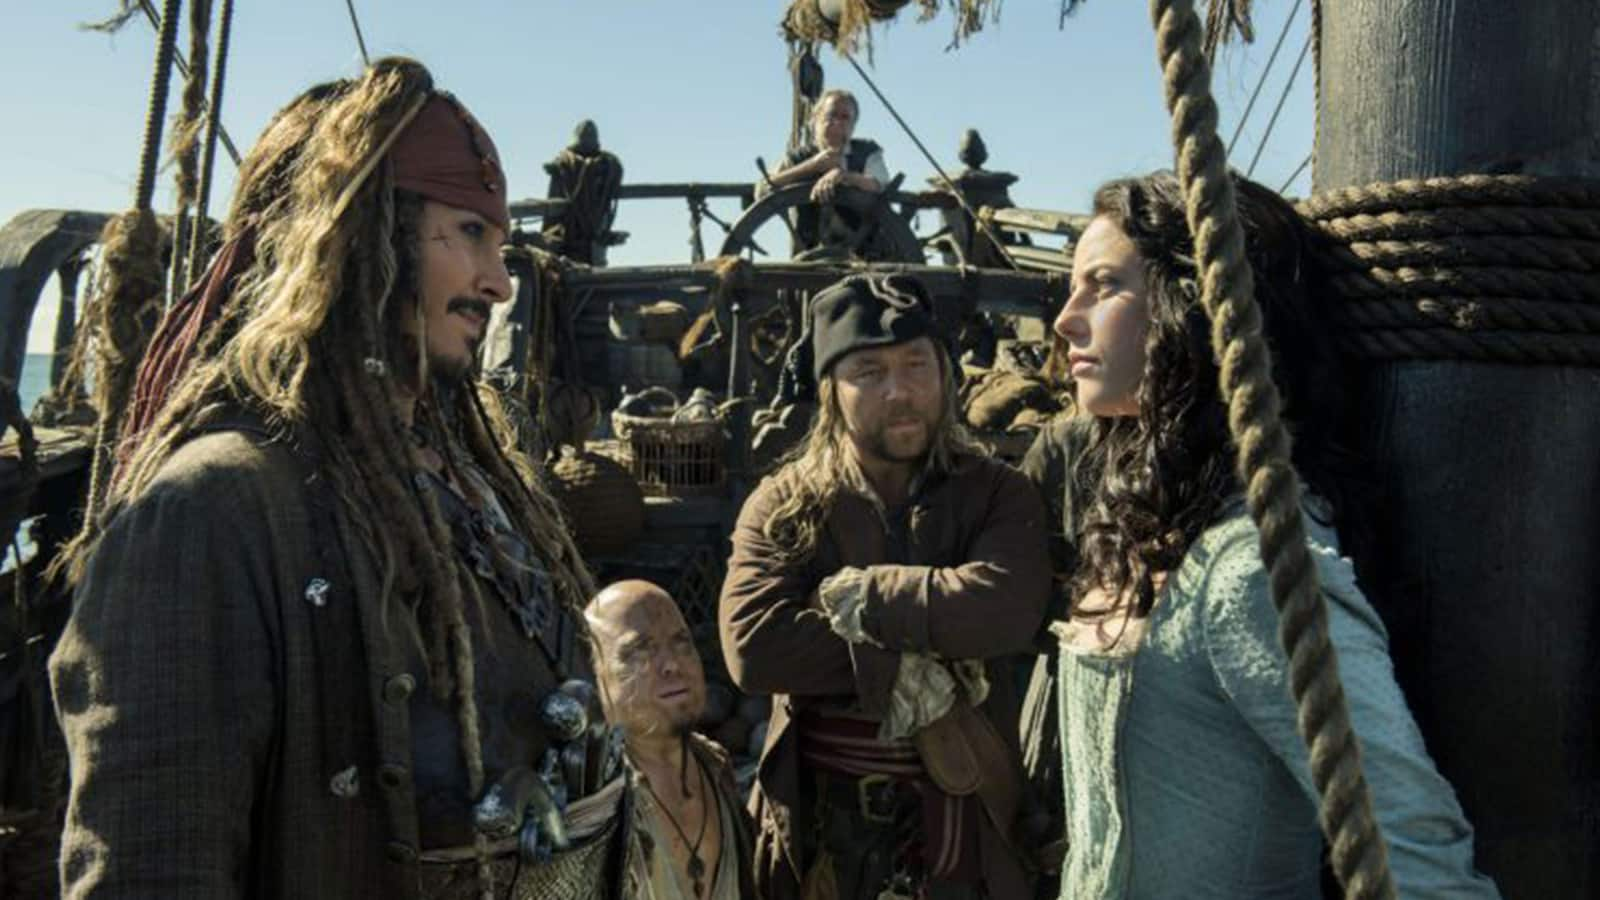 pirates-of-the-caribbean-salazars-revenge-2017